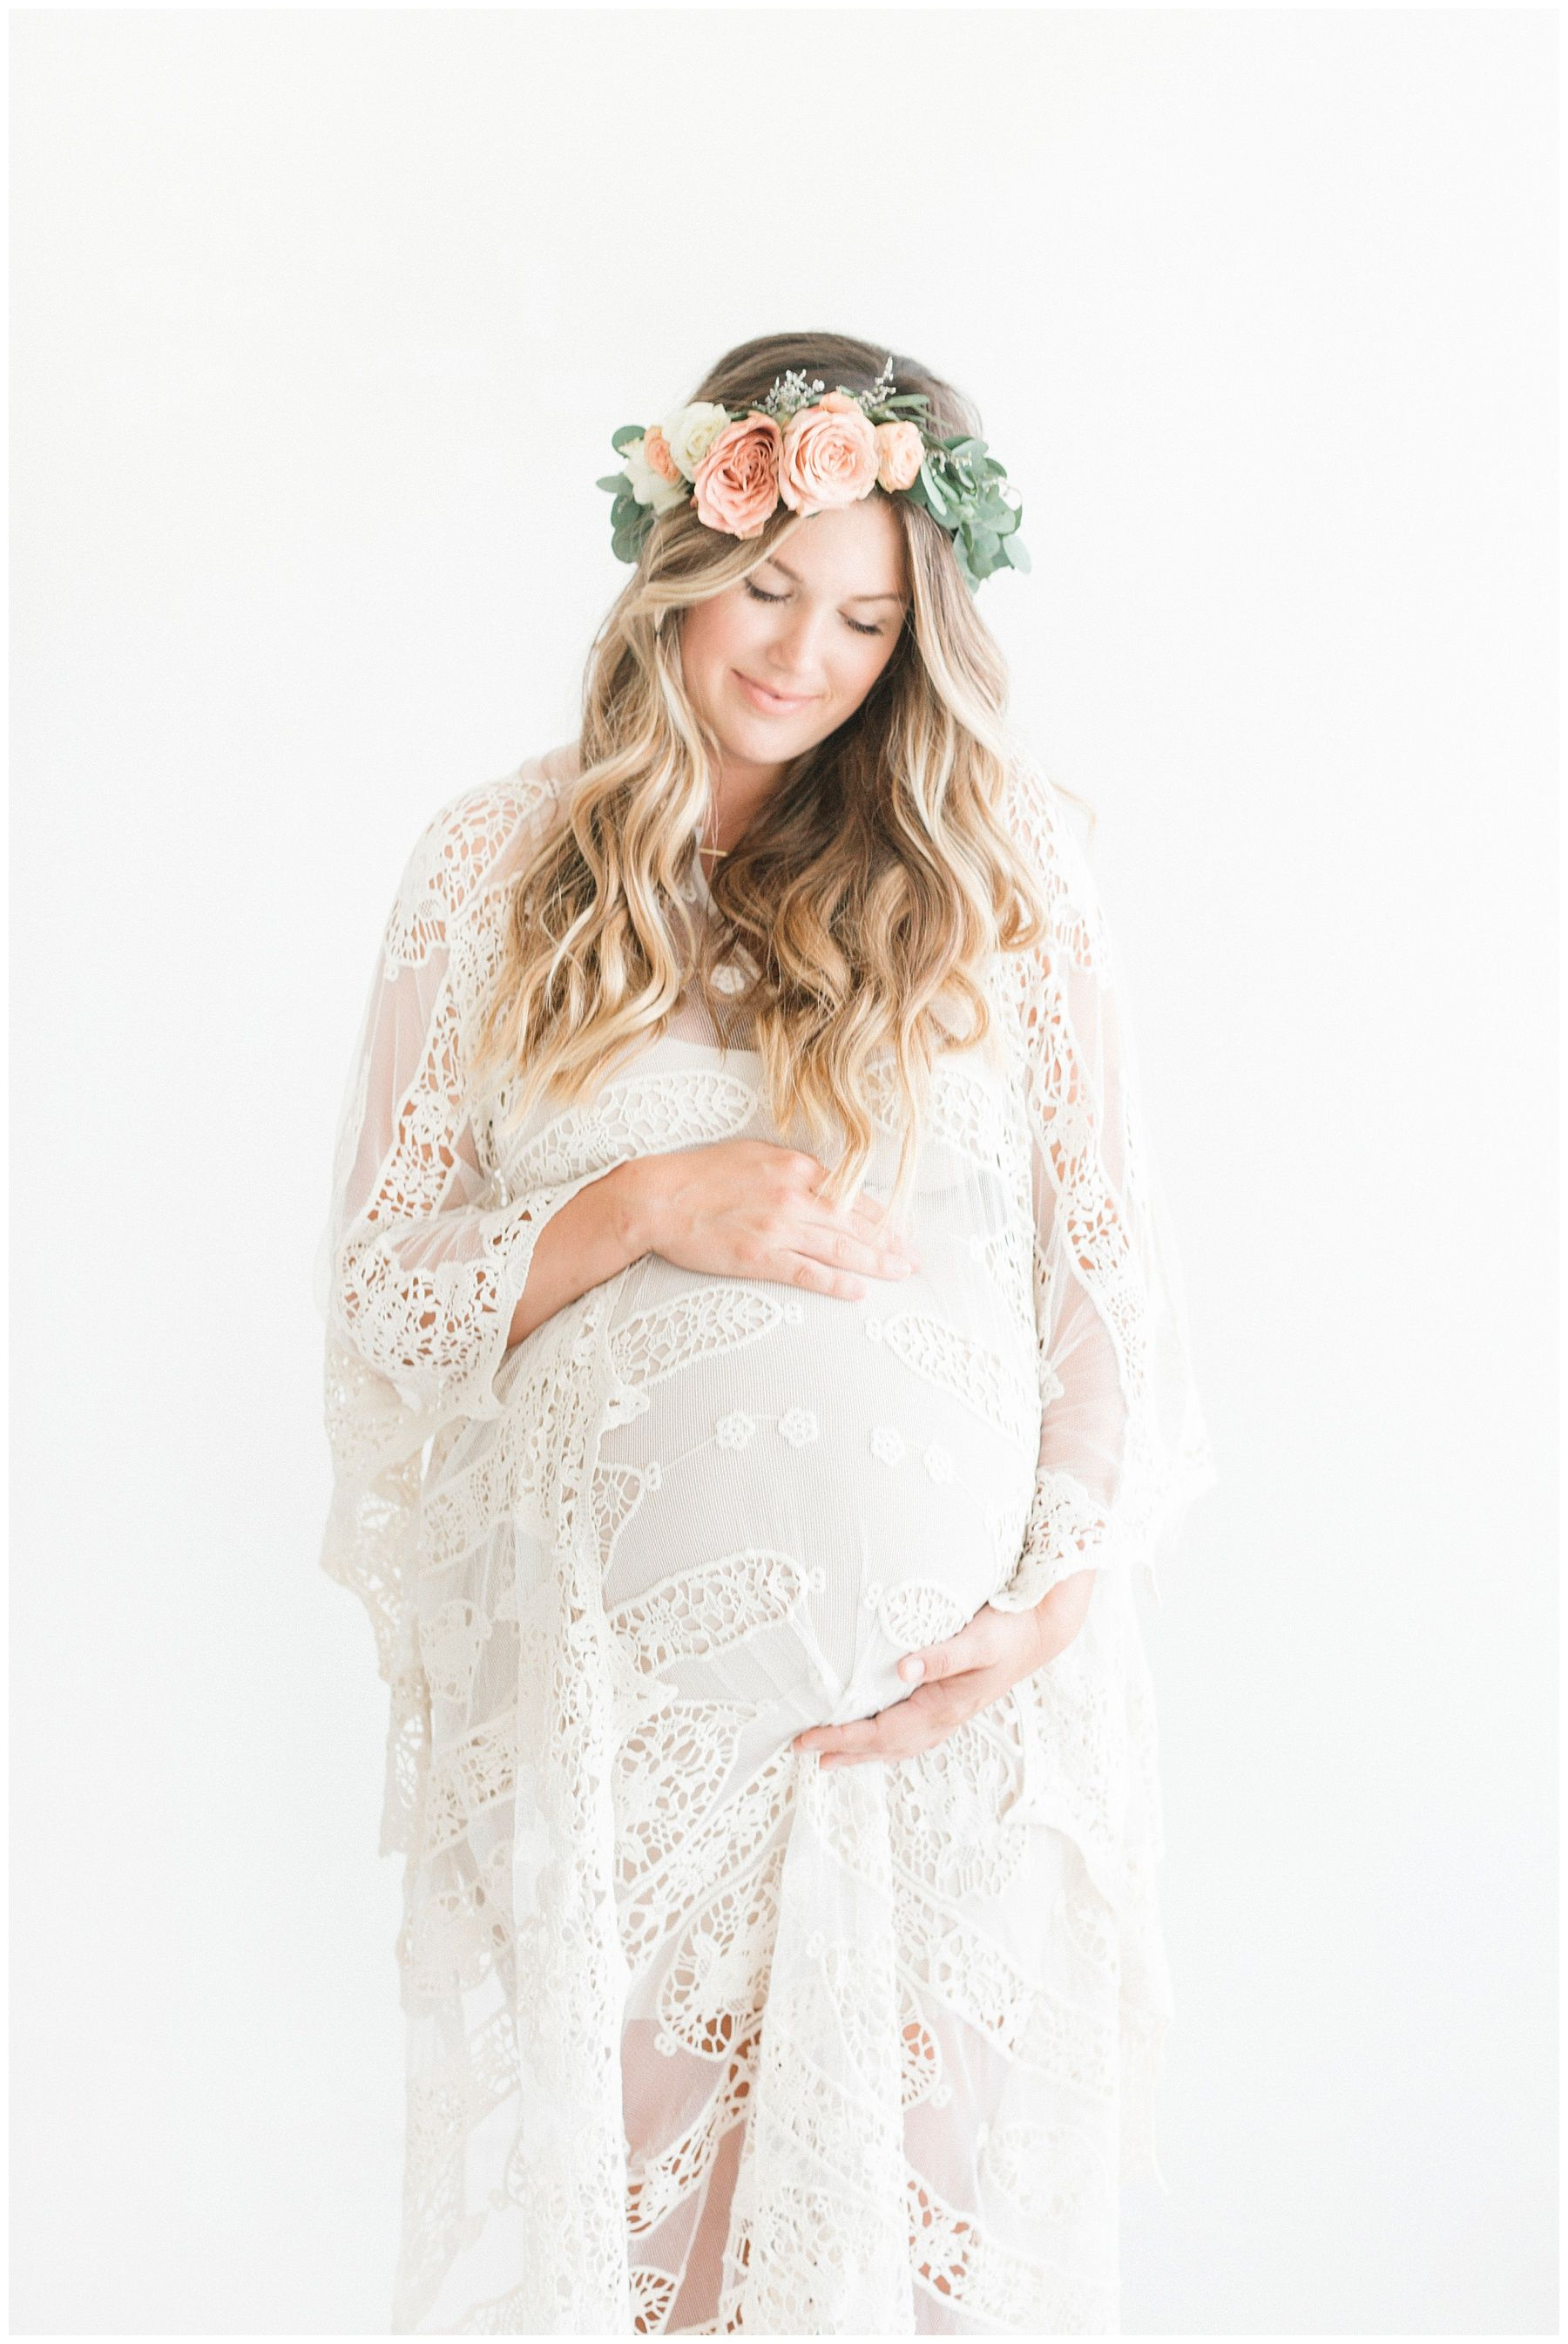 Bohemian Maternity Photography Bohemian Maternity Photography Maternity Studio Photoshoot Maternity Photography Studio